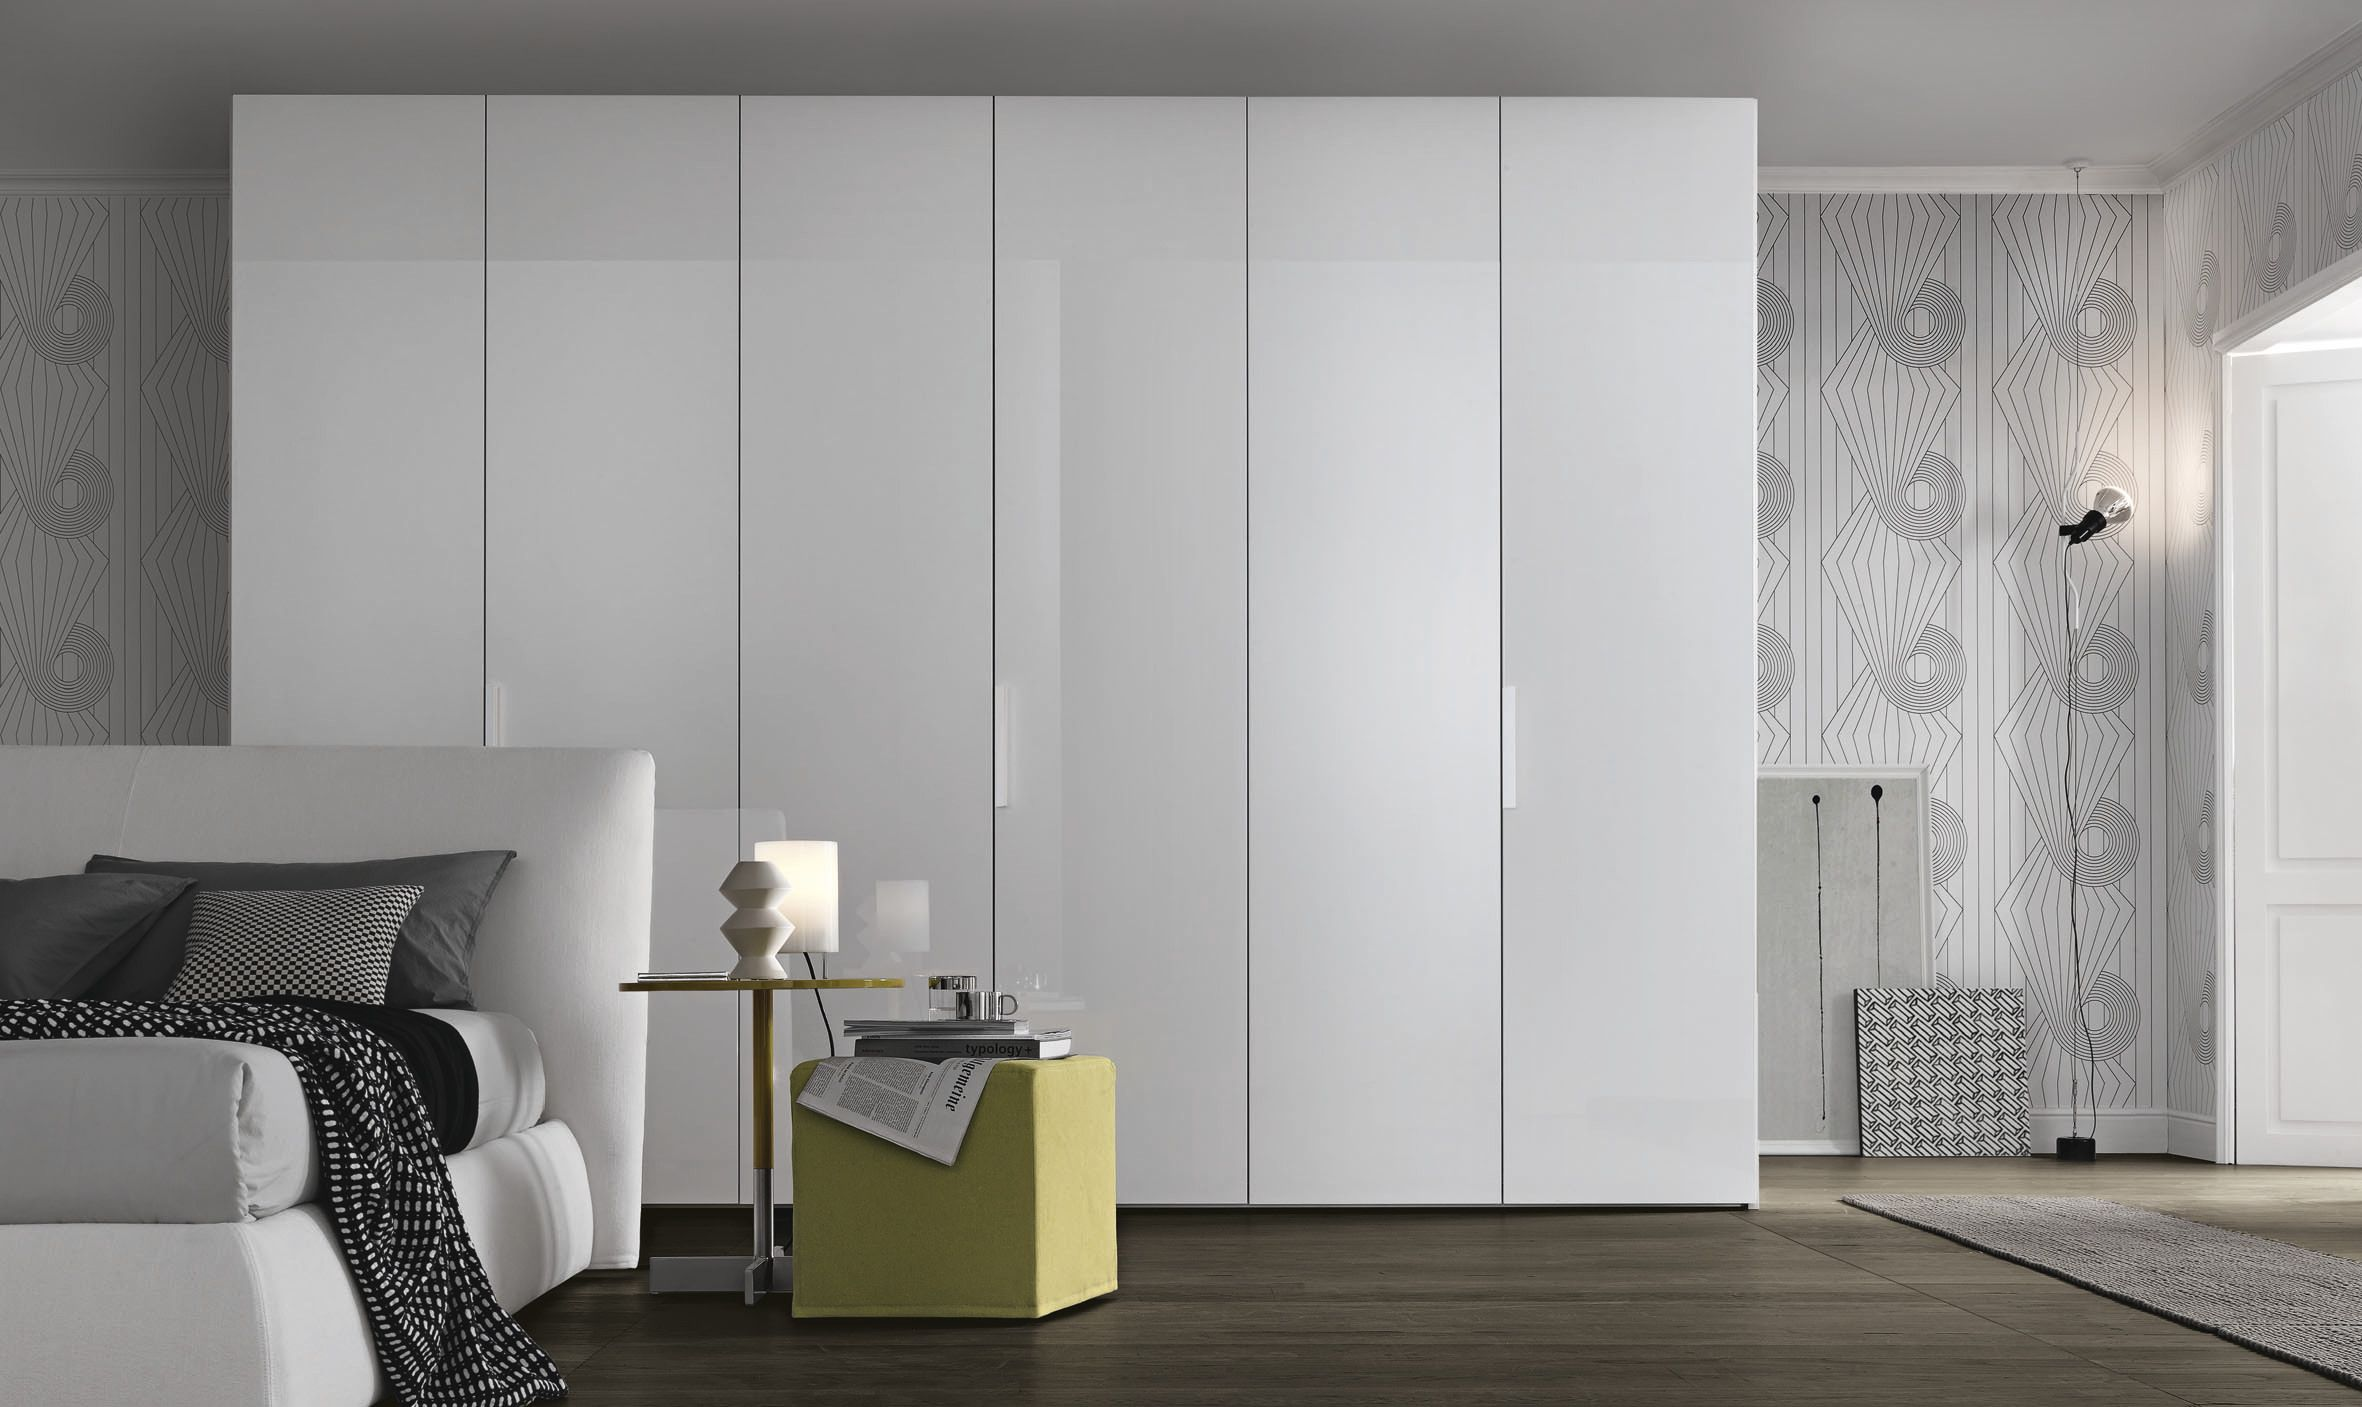 Camere Da Letto Jesse.Jesse Spa Contemporary Living Room Furniture Storage Solutions